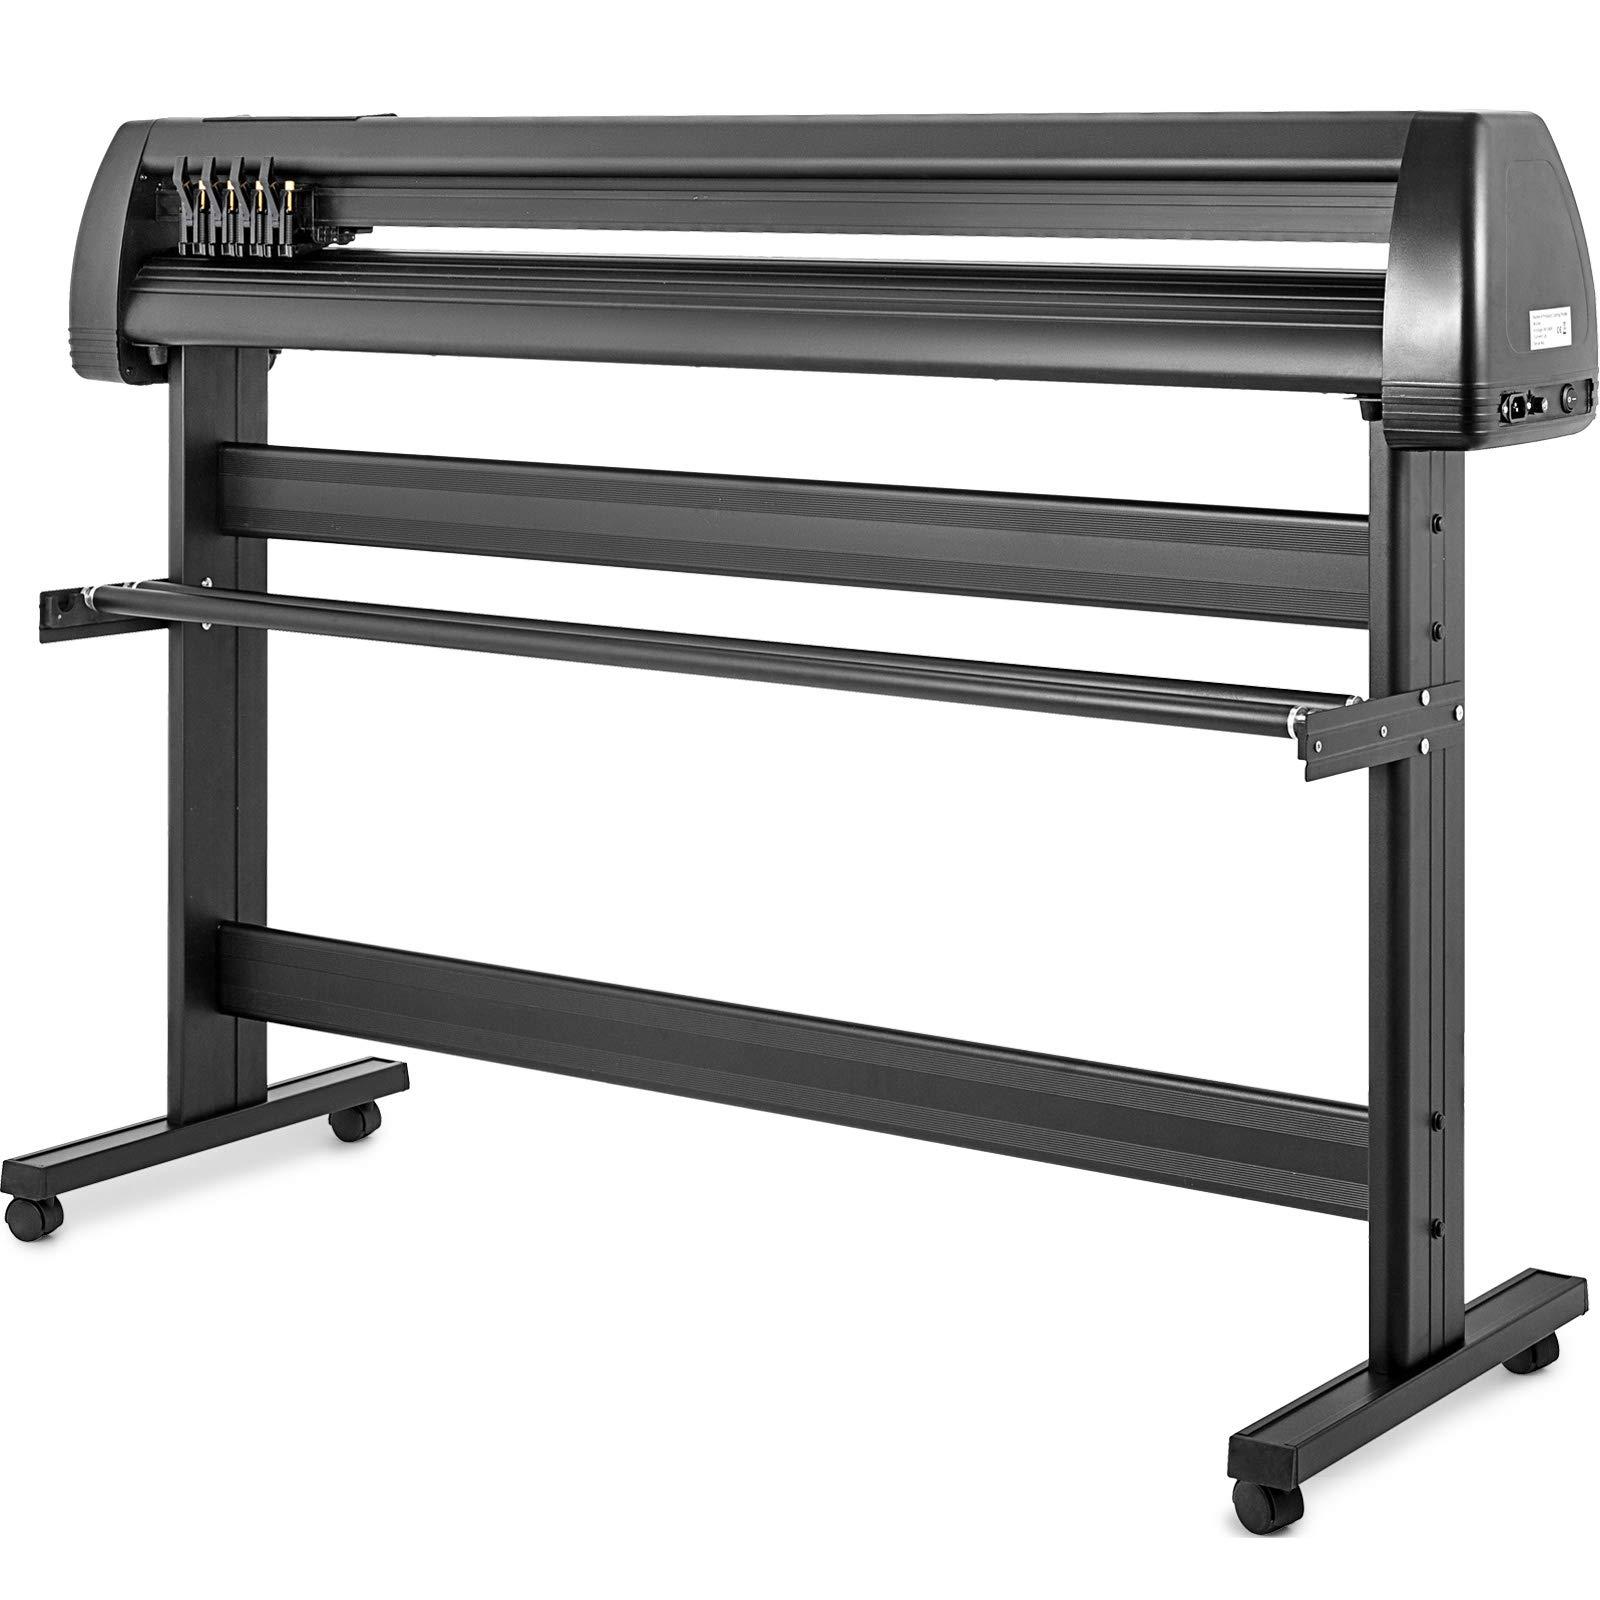 VEVOR Vinyl Cutter 53 inch Plotter Machine 1340mm Paper Feed Vinyl Cutter Plotter Signmaster Software Sign Making Machinewith Stand (53Inch Style 2) by VEVOR (Image #4)